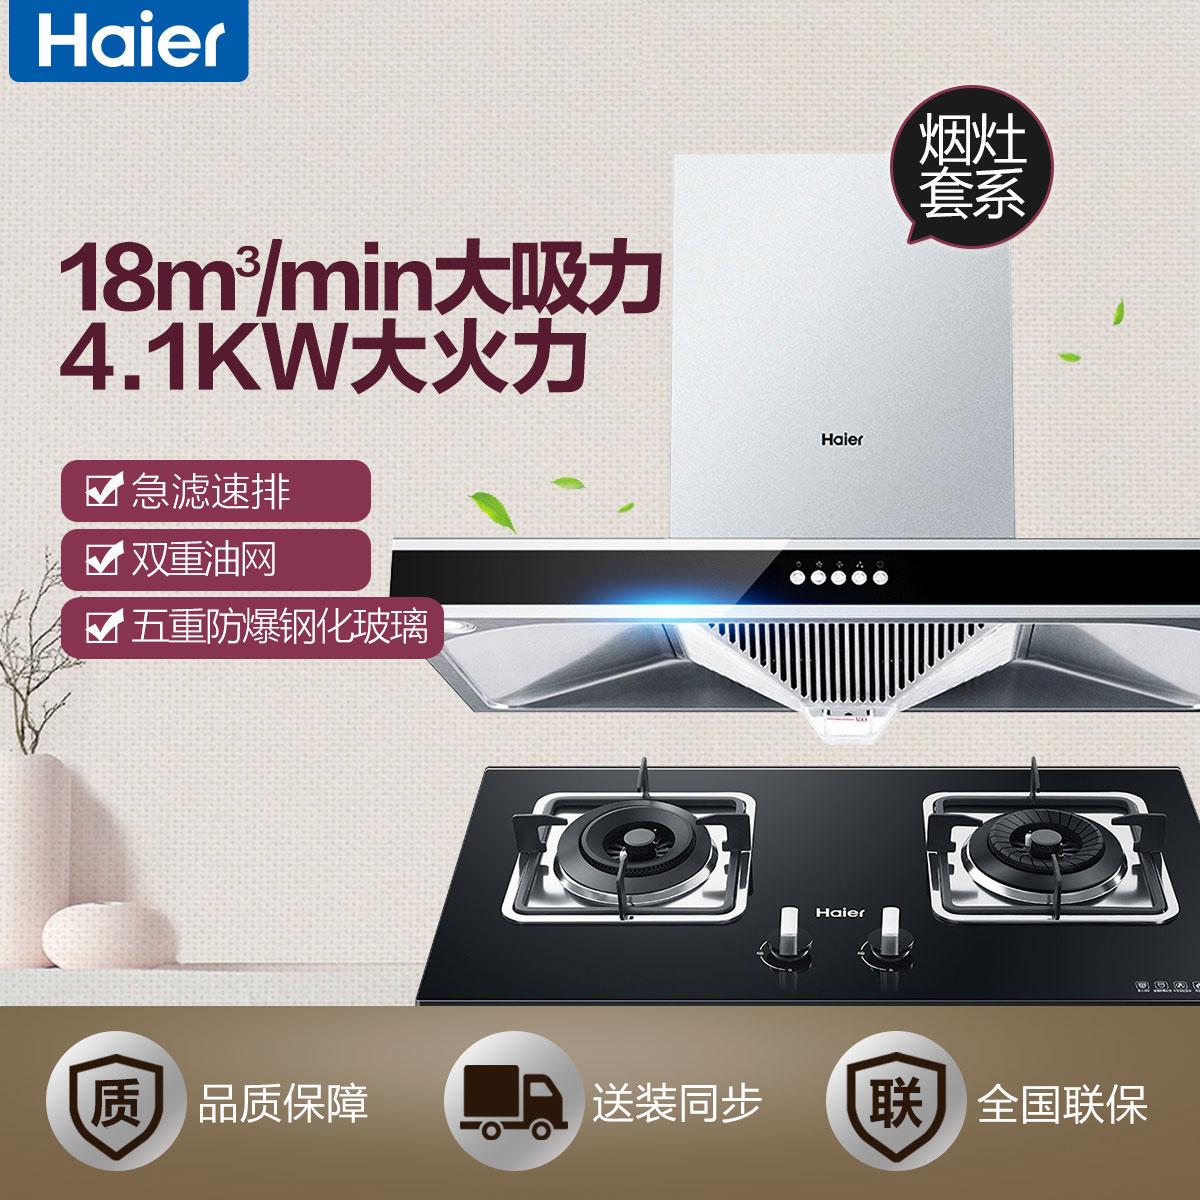 Haier/海尔 烟灶套系 CXW-200-E900T2S+JZT-QE5B1(12T)